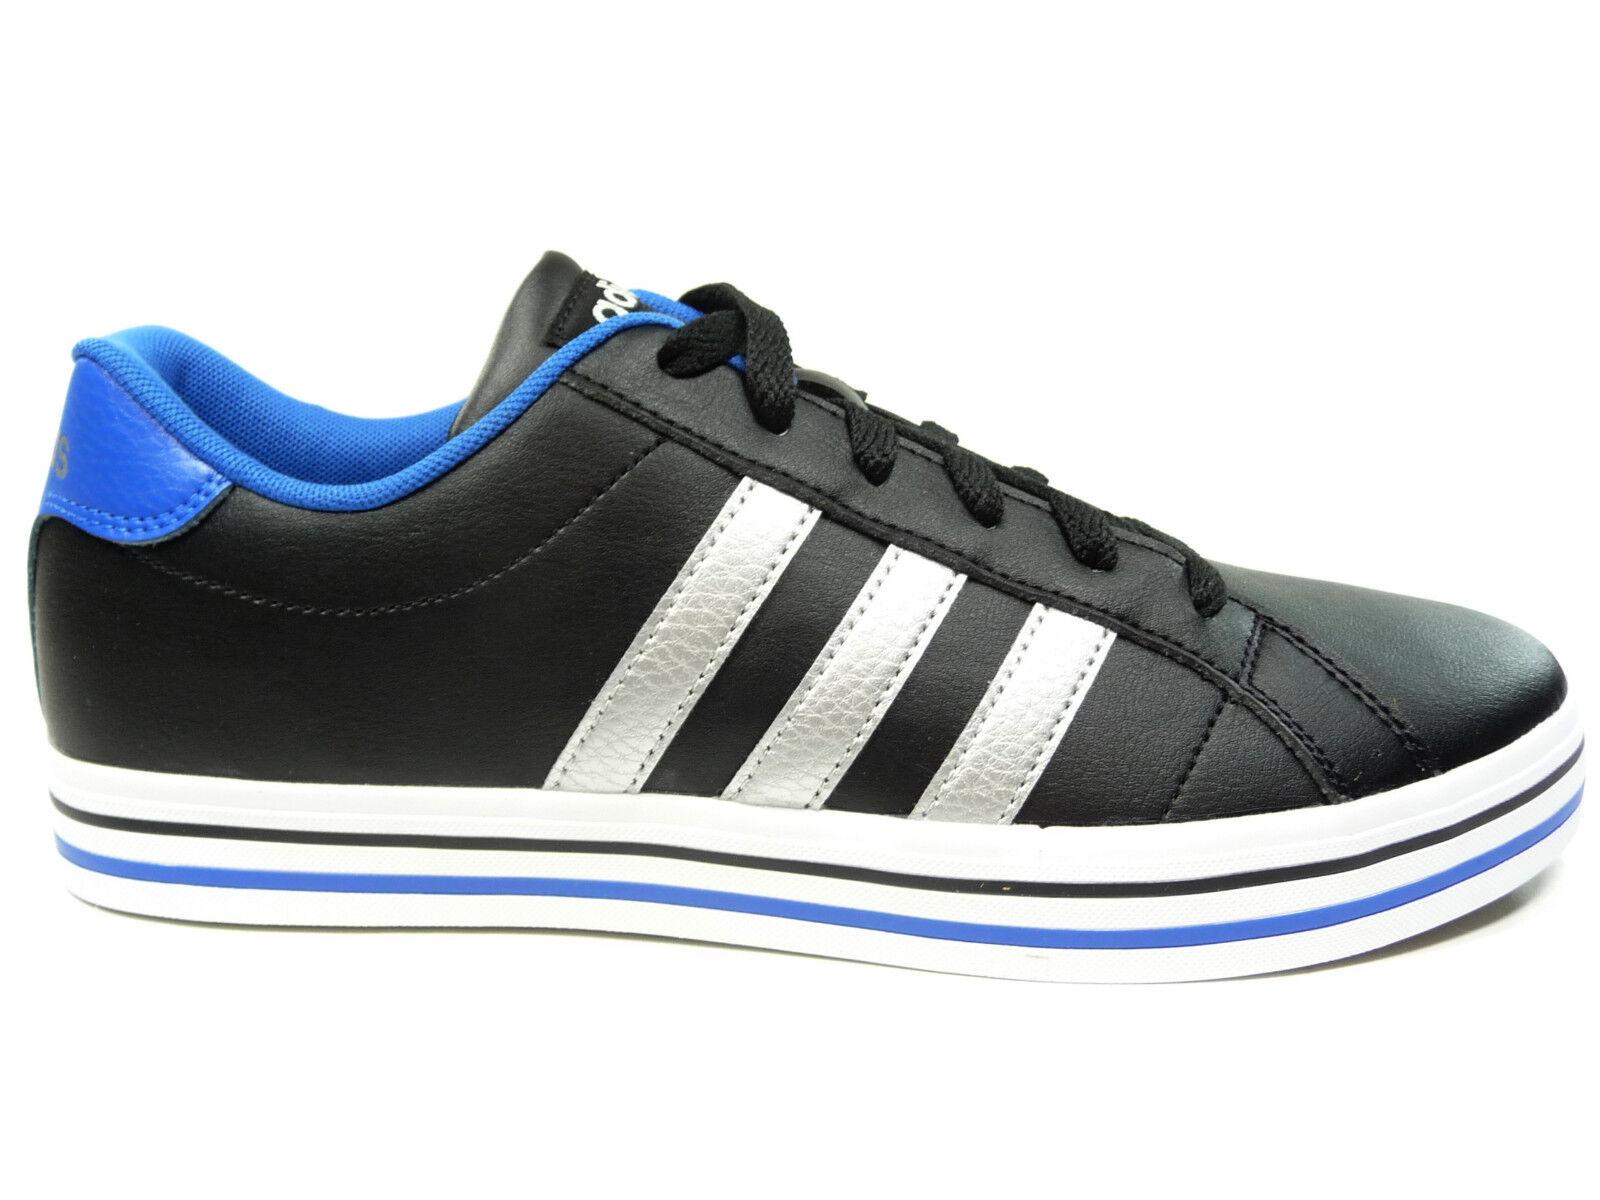 adidas Neo Herrenhalbschuhe Sport Retro Sneaker in Schwarz Silber WEEKLY AW5197